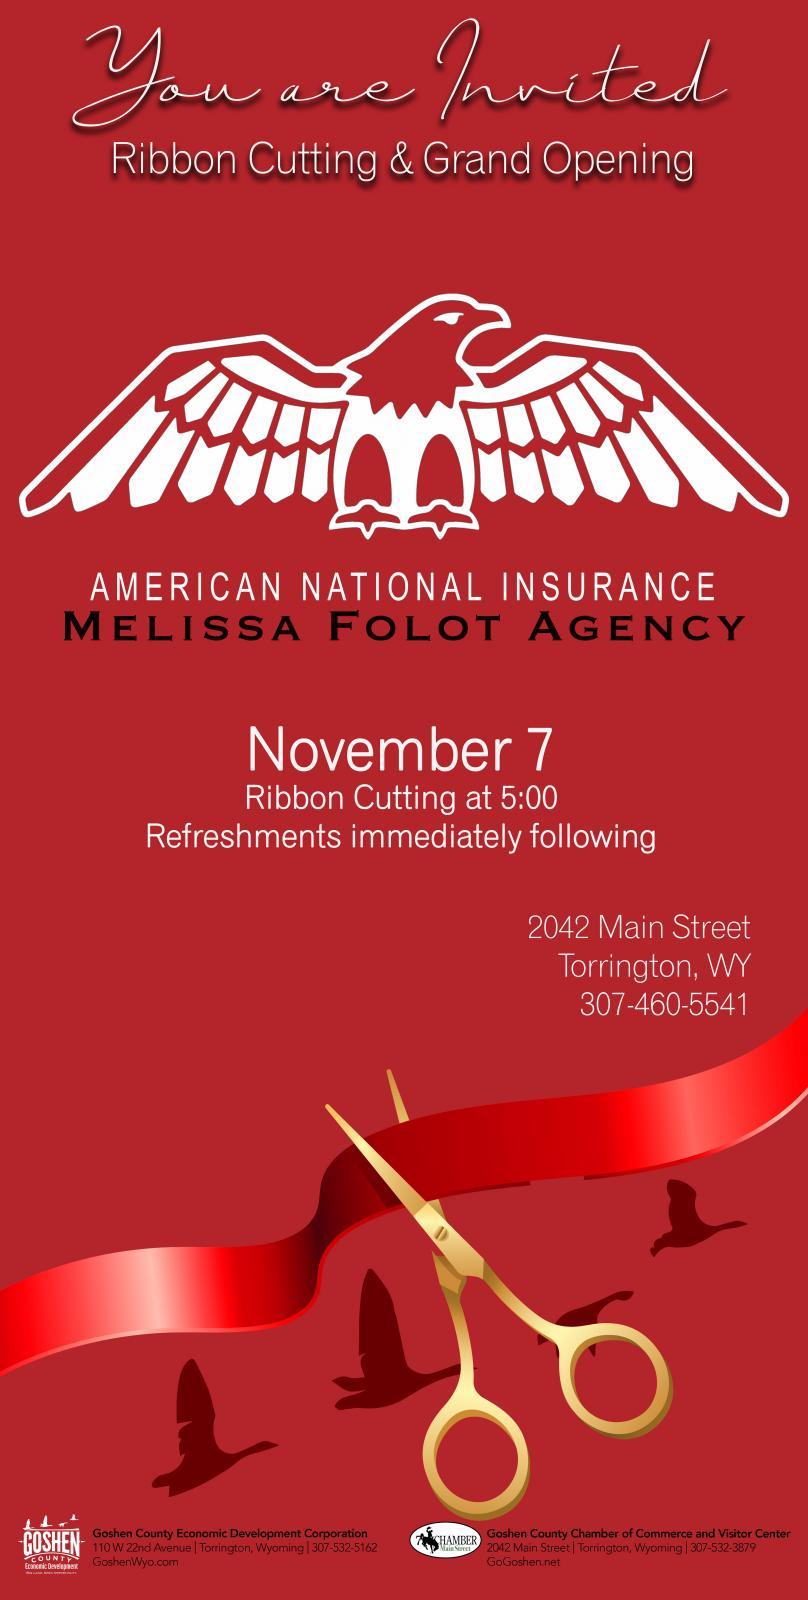 American National Insurance Melissa Folot Agency Ribbon Cutting Photo